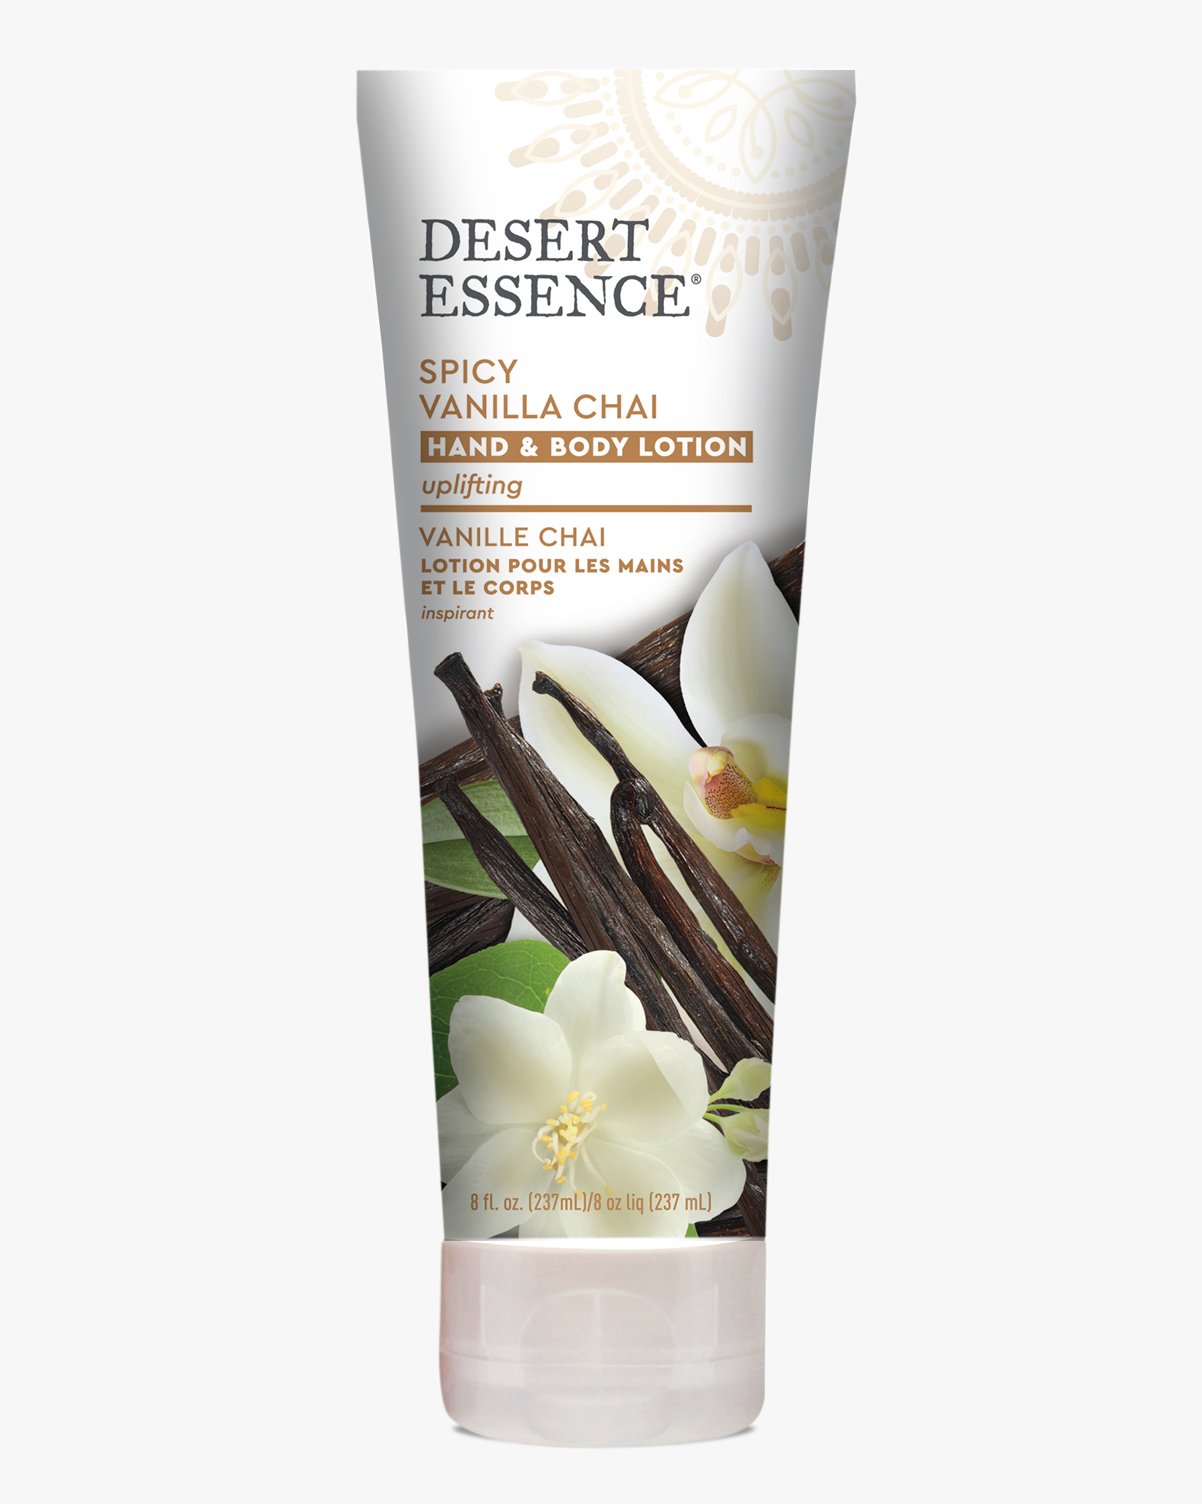 Desert Essence coupon: Desert Essence Spicy Vanilla Chai Hand & Body Lotion, 8 fl. oz. | Vegan | Gluten-Free